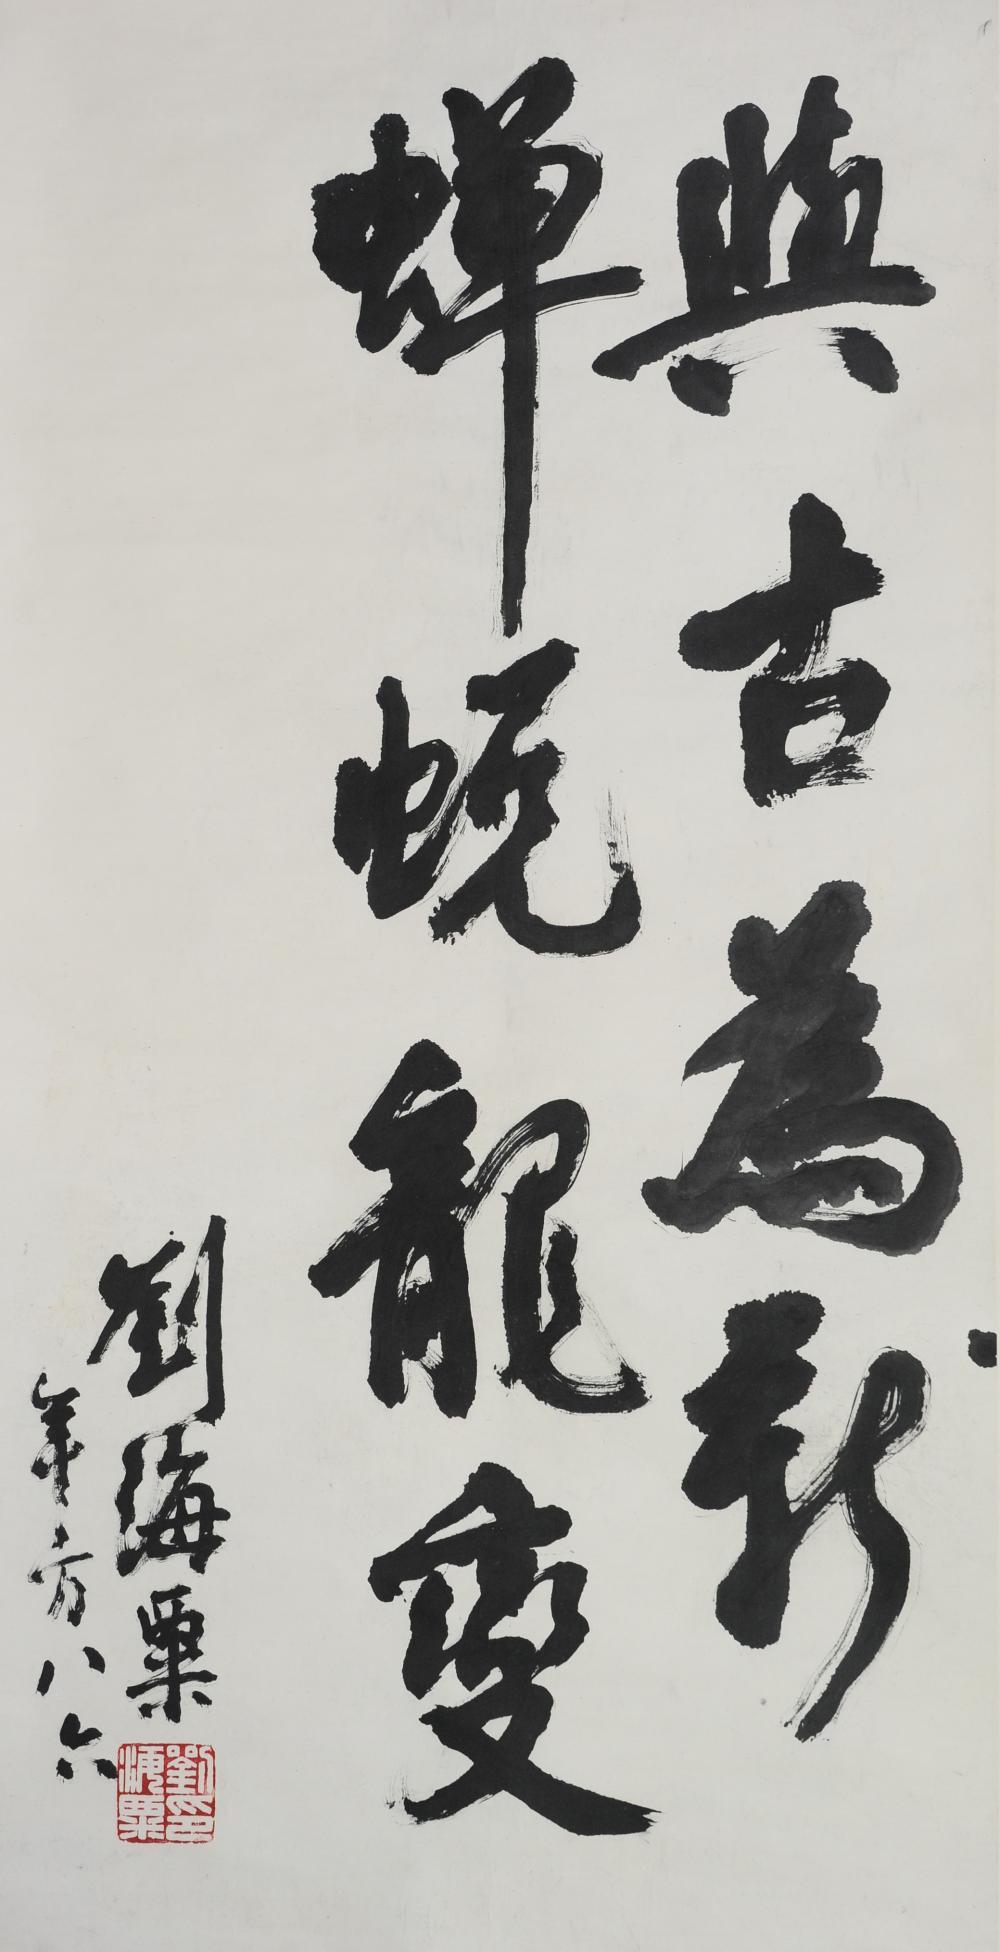 CHINESE 8-CHARACTER CALLIGRAPHY BY LIU HAISHU